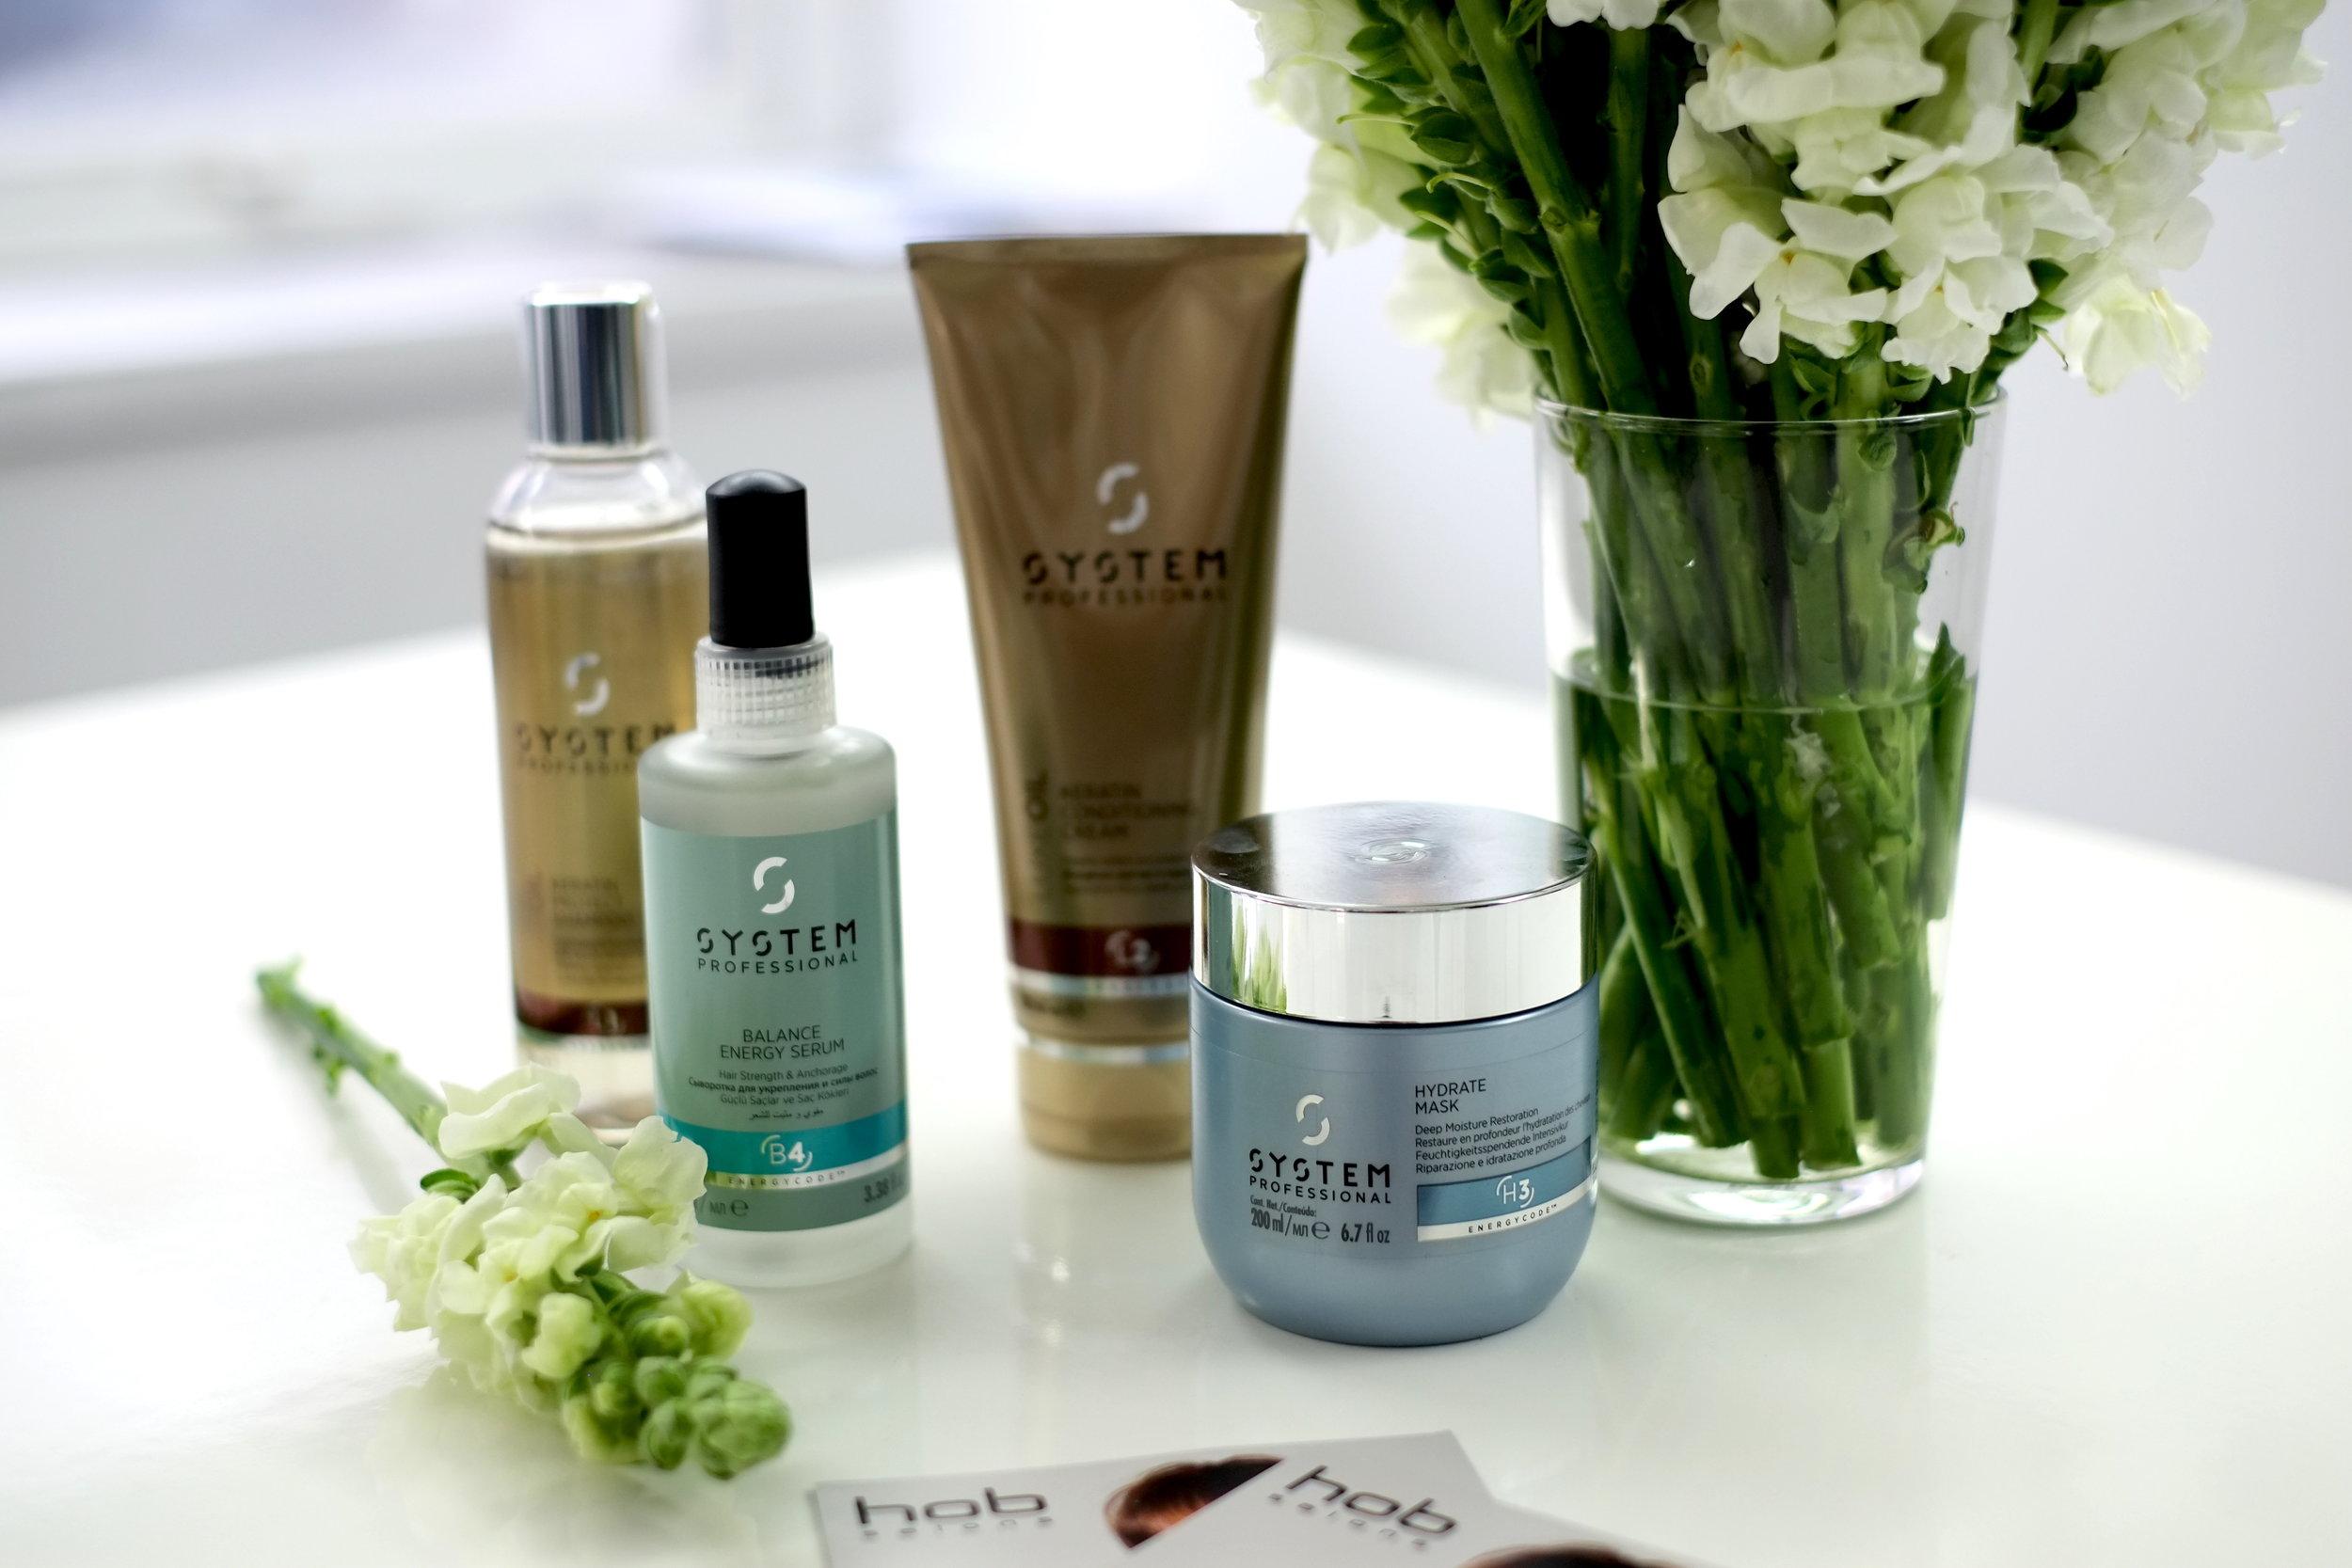 Keratin Protect  Shampoo,  Balance Energy  Serum,  Keratin  Conditioning Cream,  Hydrate  Mask